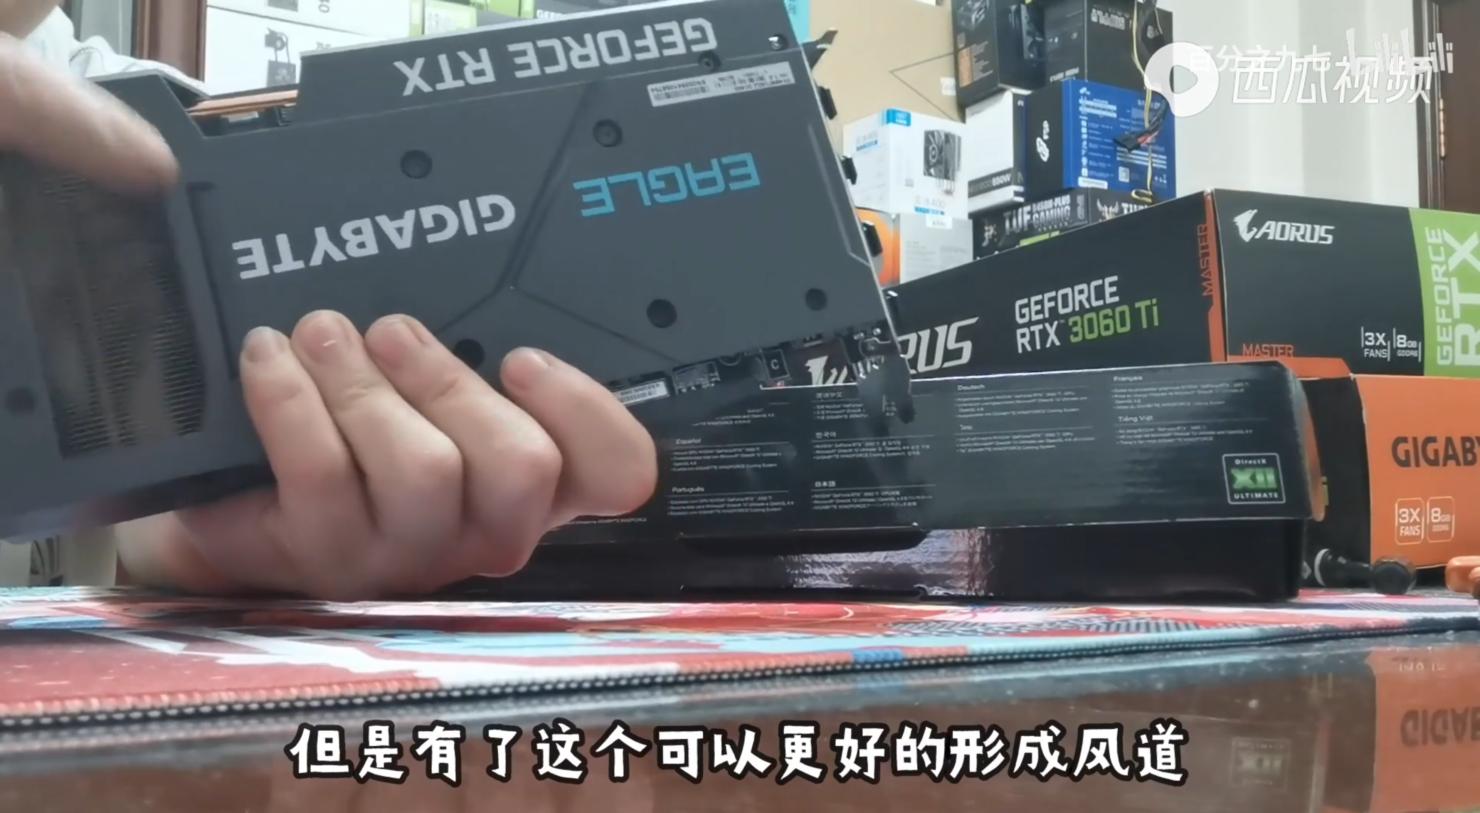 gigabyte-geforce-rtx-3060-ti-eagle-oc-graphics-card_5